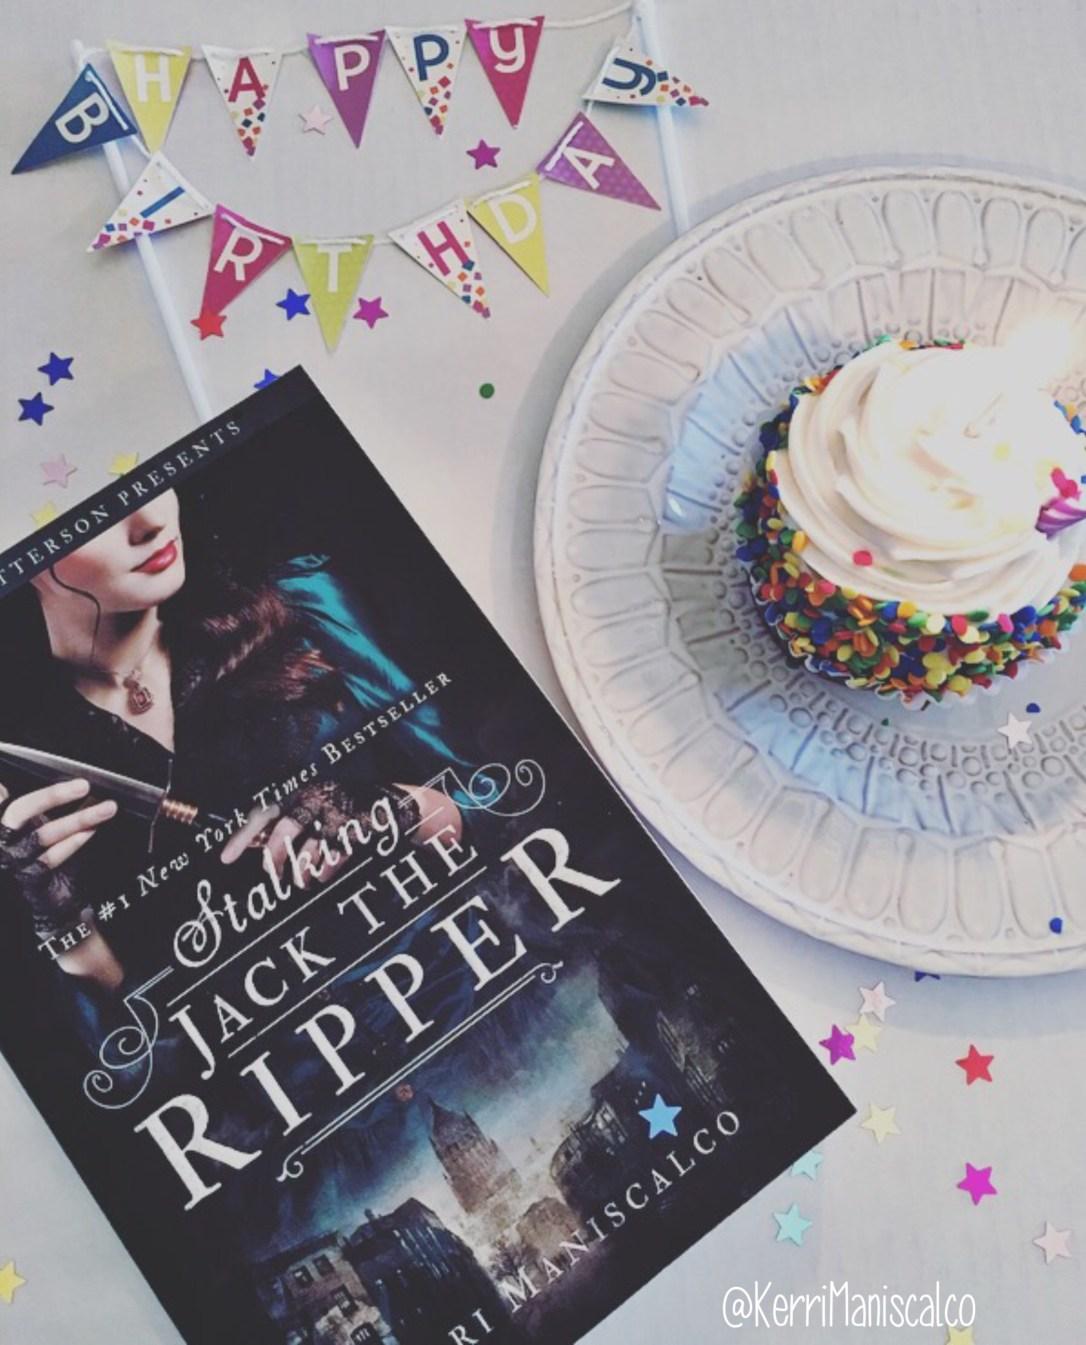 SJTR paperback birthday